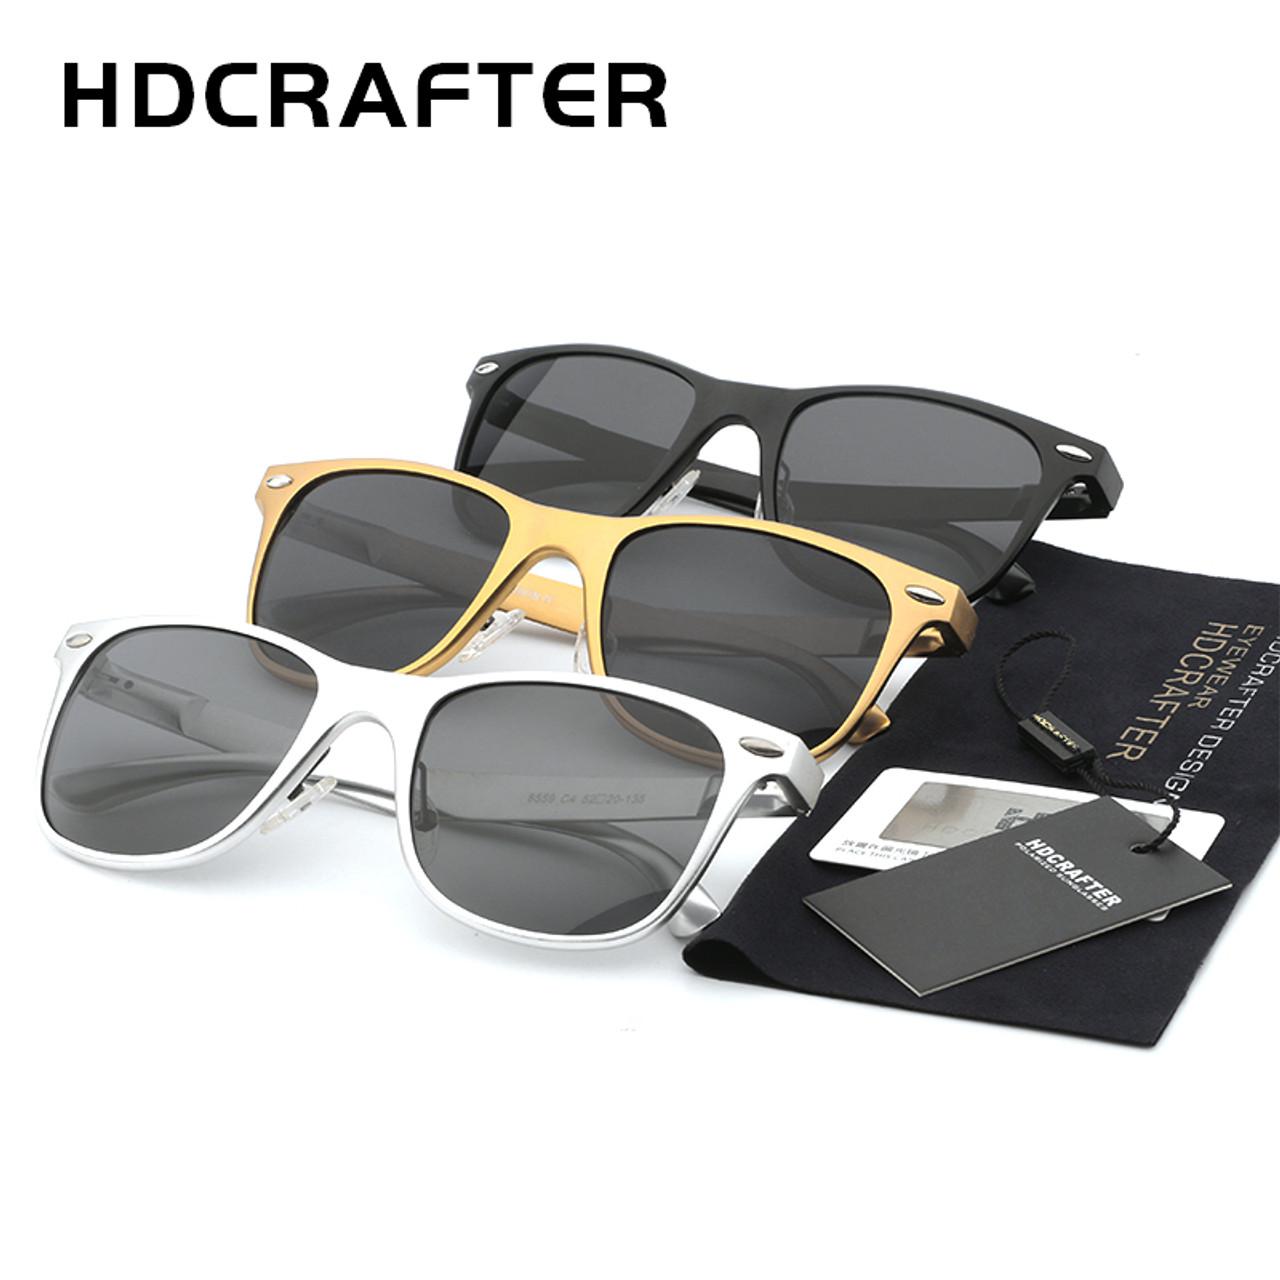 ac340bacf6 ... HDCRAFTER Brand Unisex Aluminum Square Men s Polarized Mirror Sun  Glasses Female Eyewears Accessories Sunglasses For ...